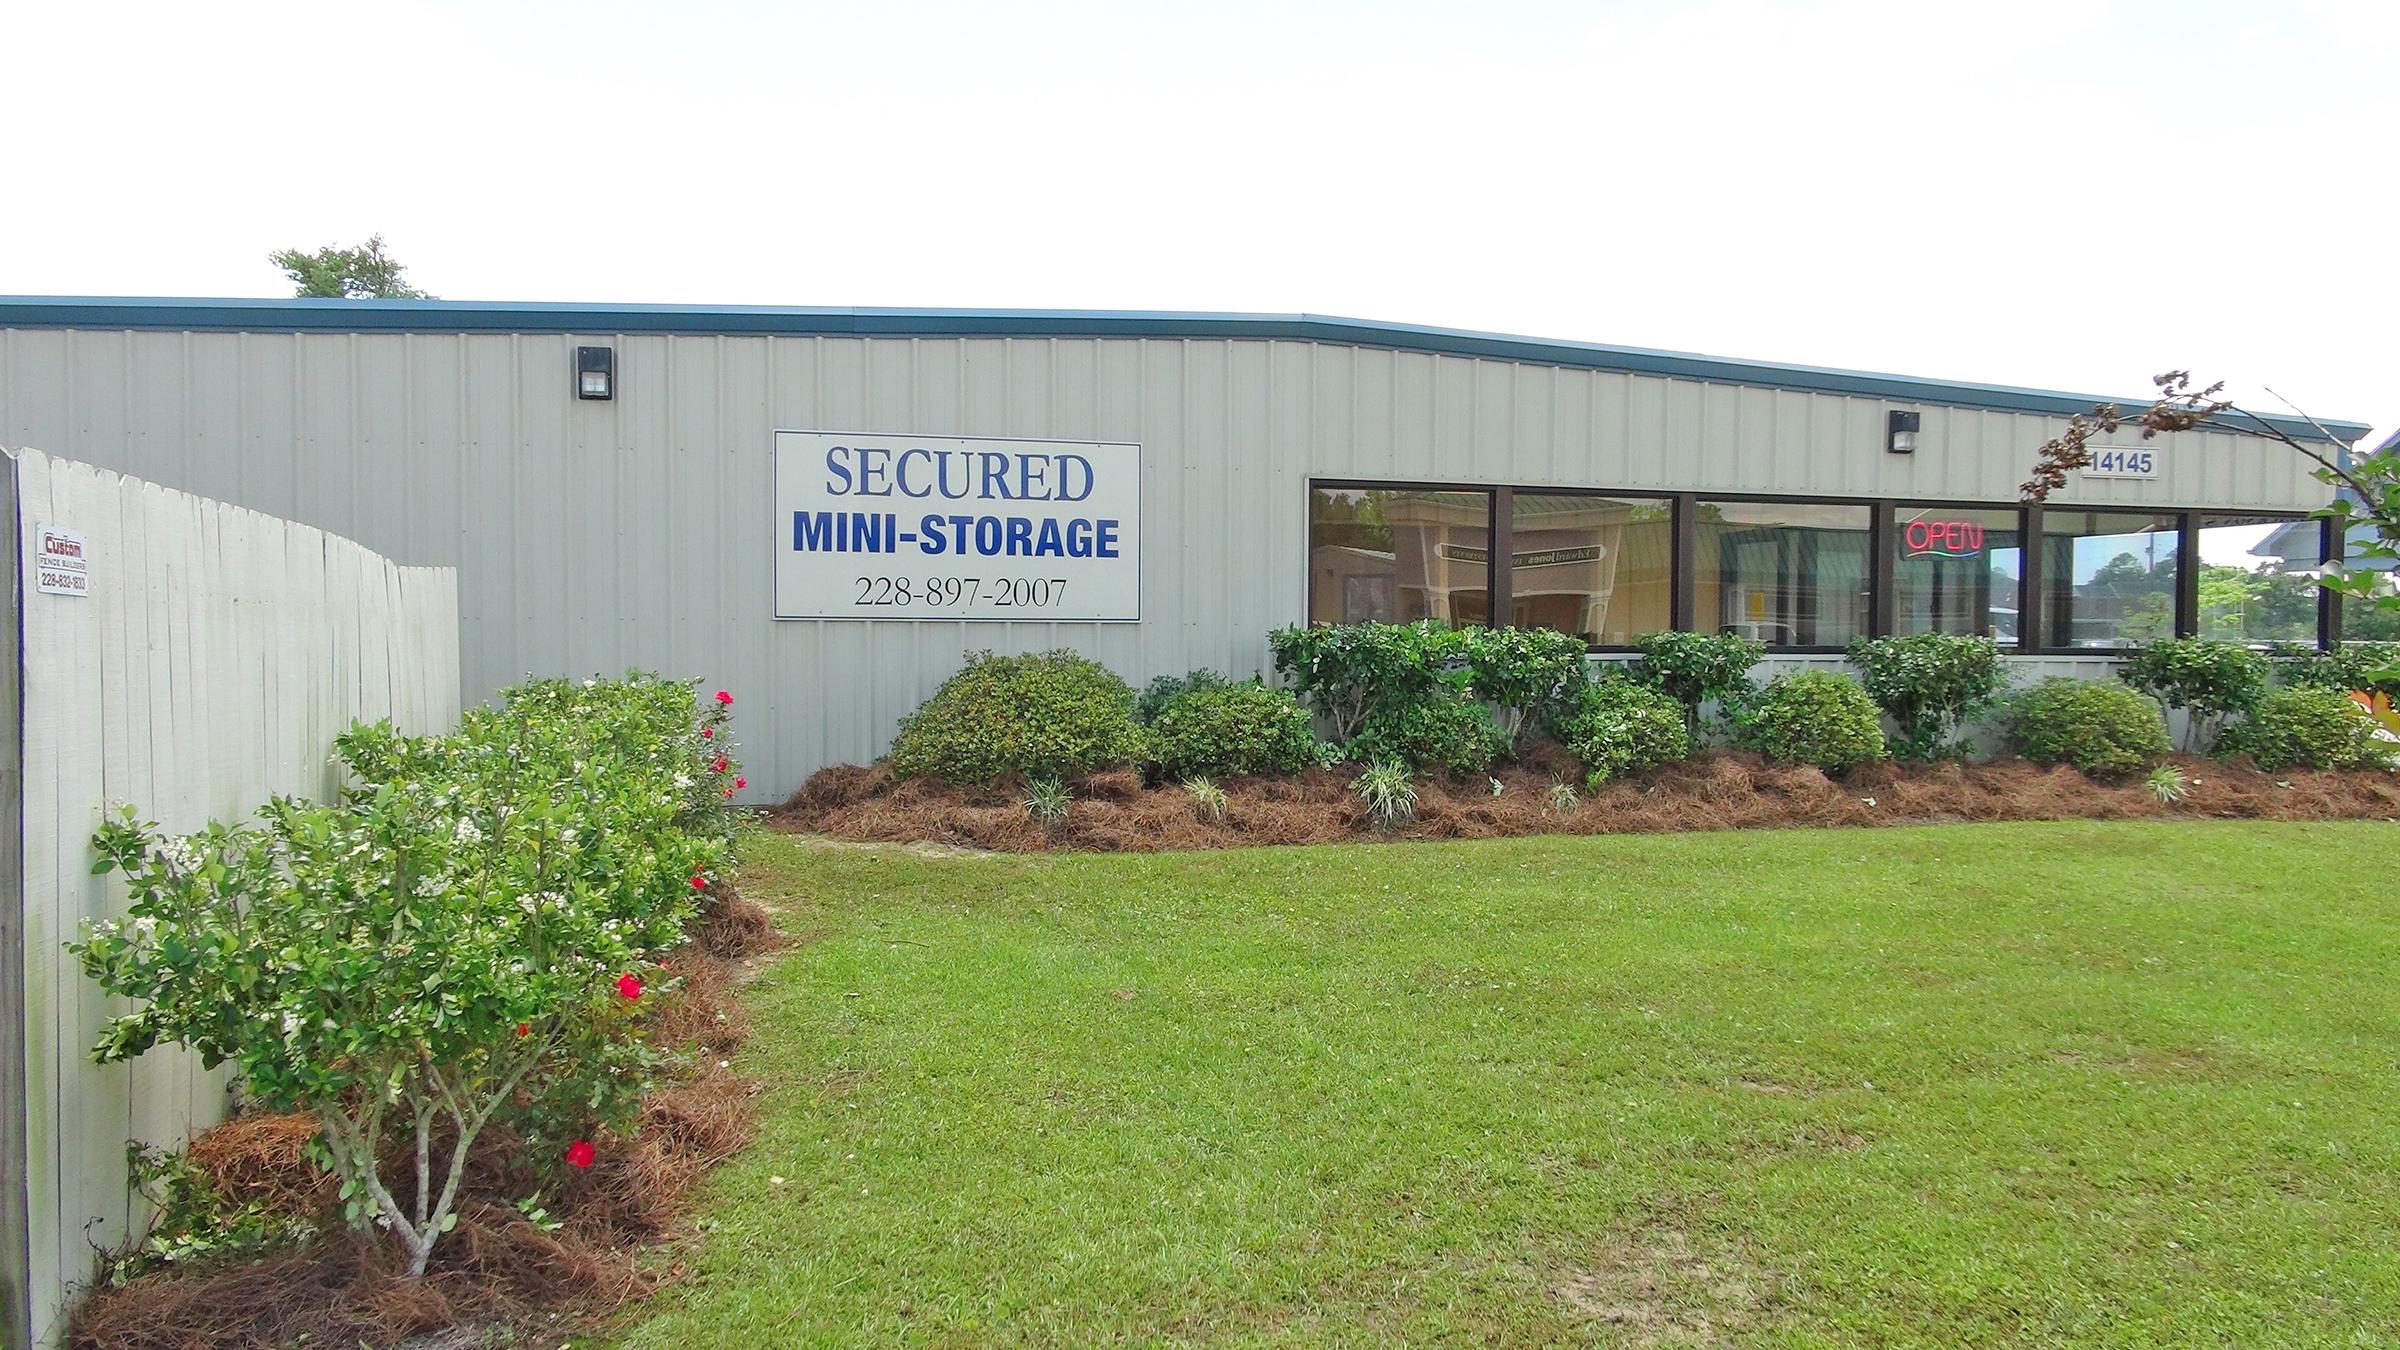 Secured Mini Storage Ii In Gulfport Ms 228 207 1